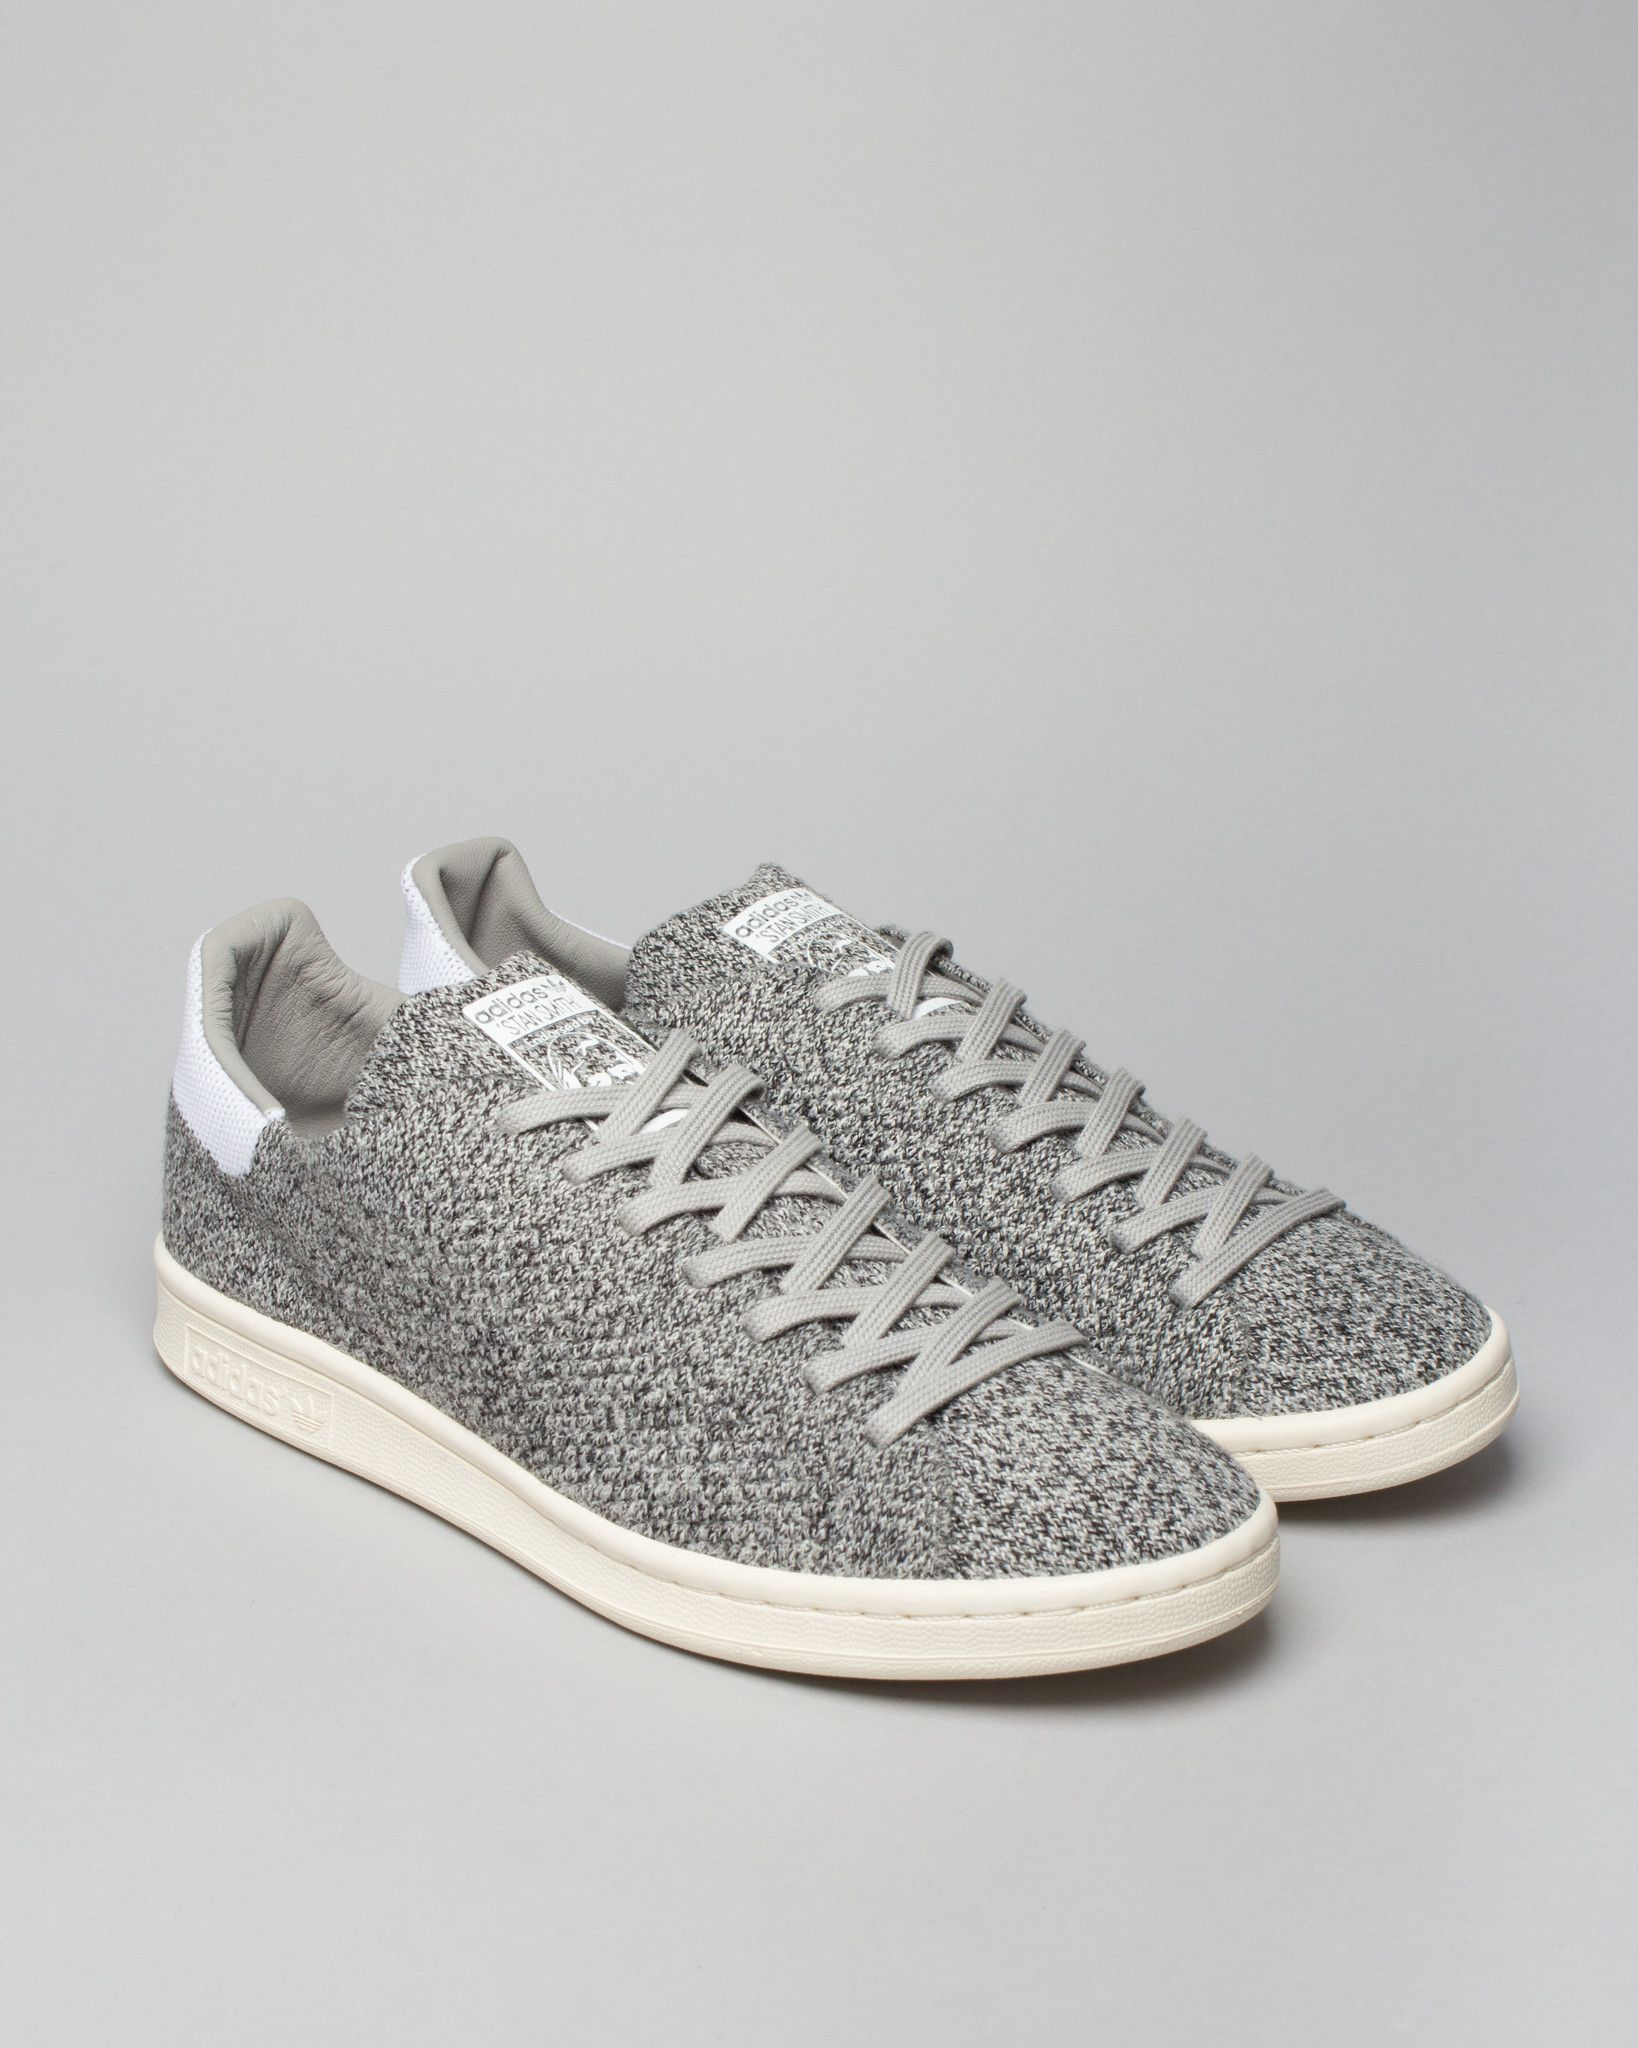 Stan Smith Wool Primeknit Multi Solid Grey   Men's Shoes